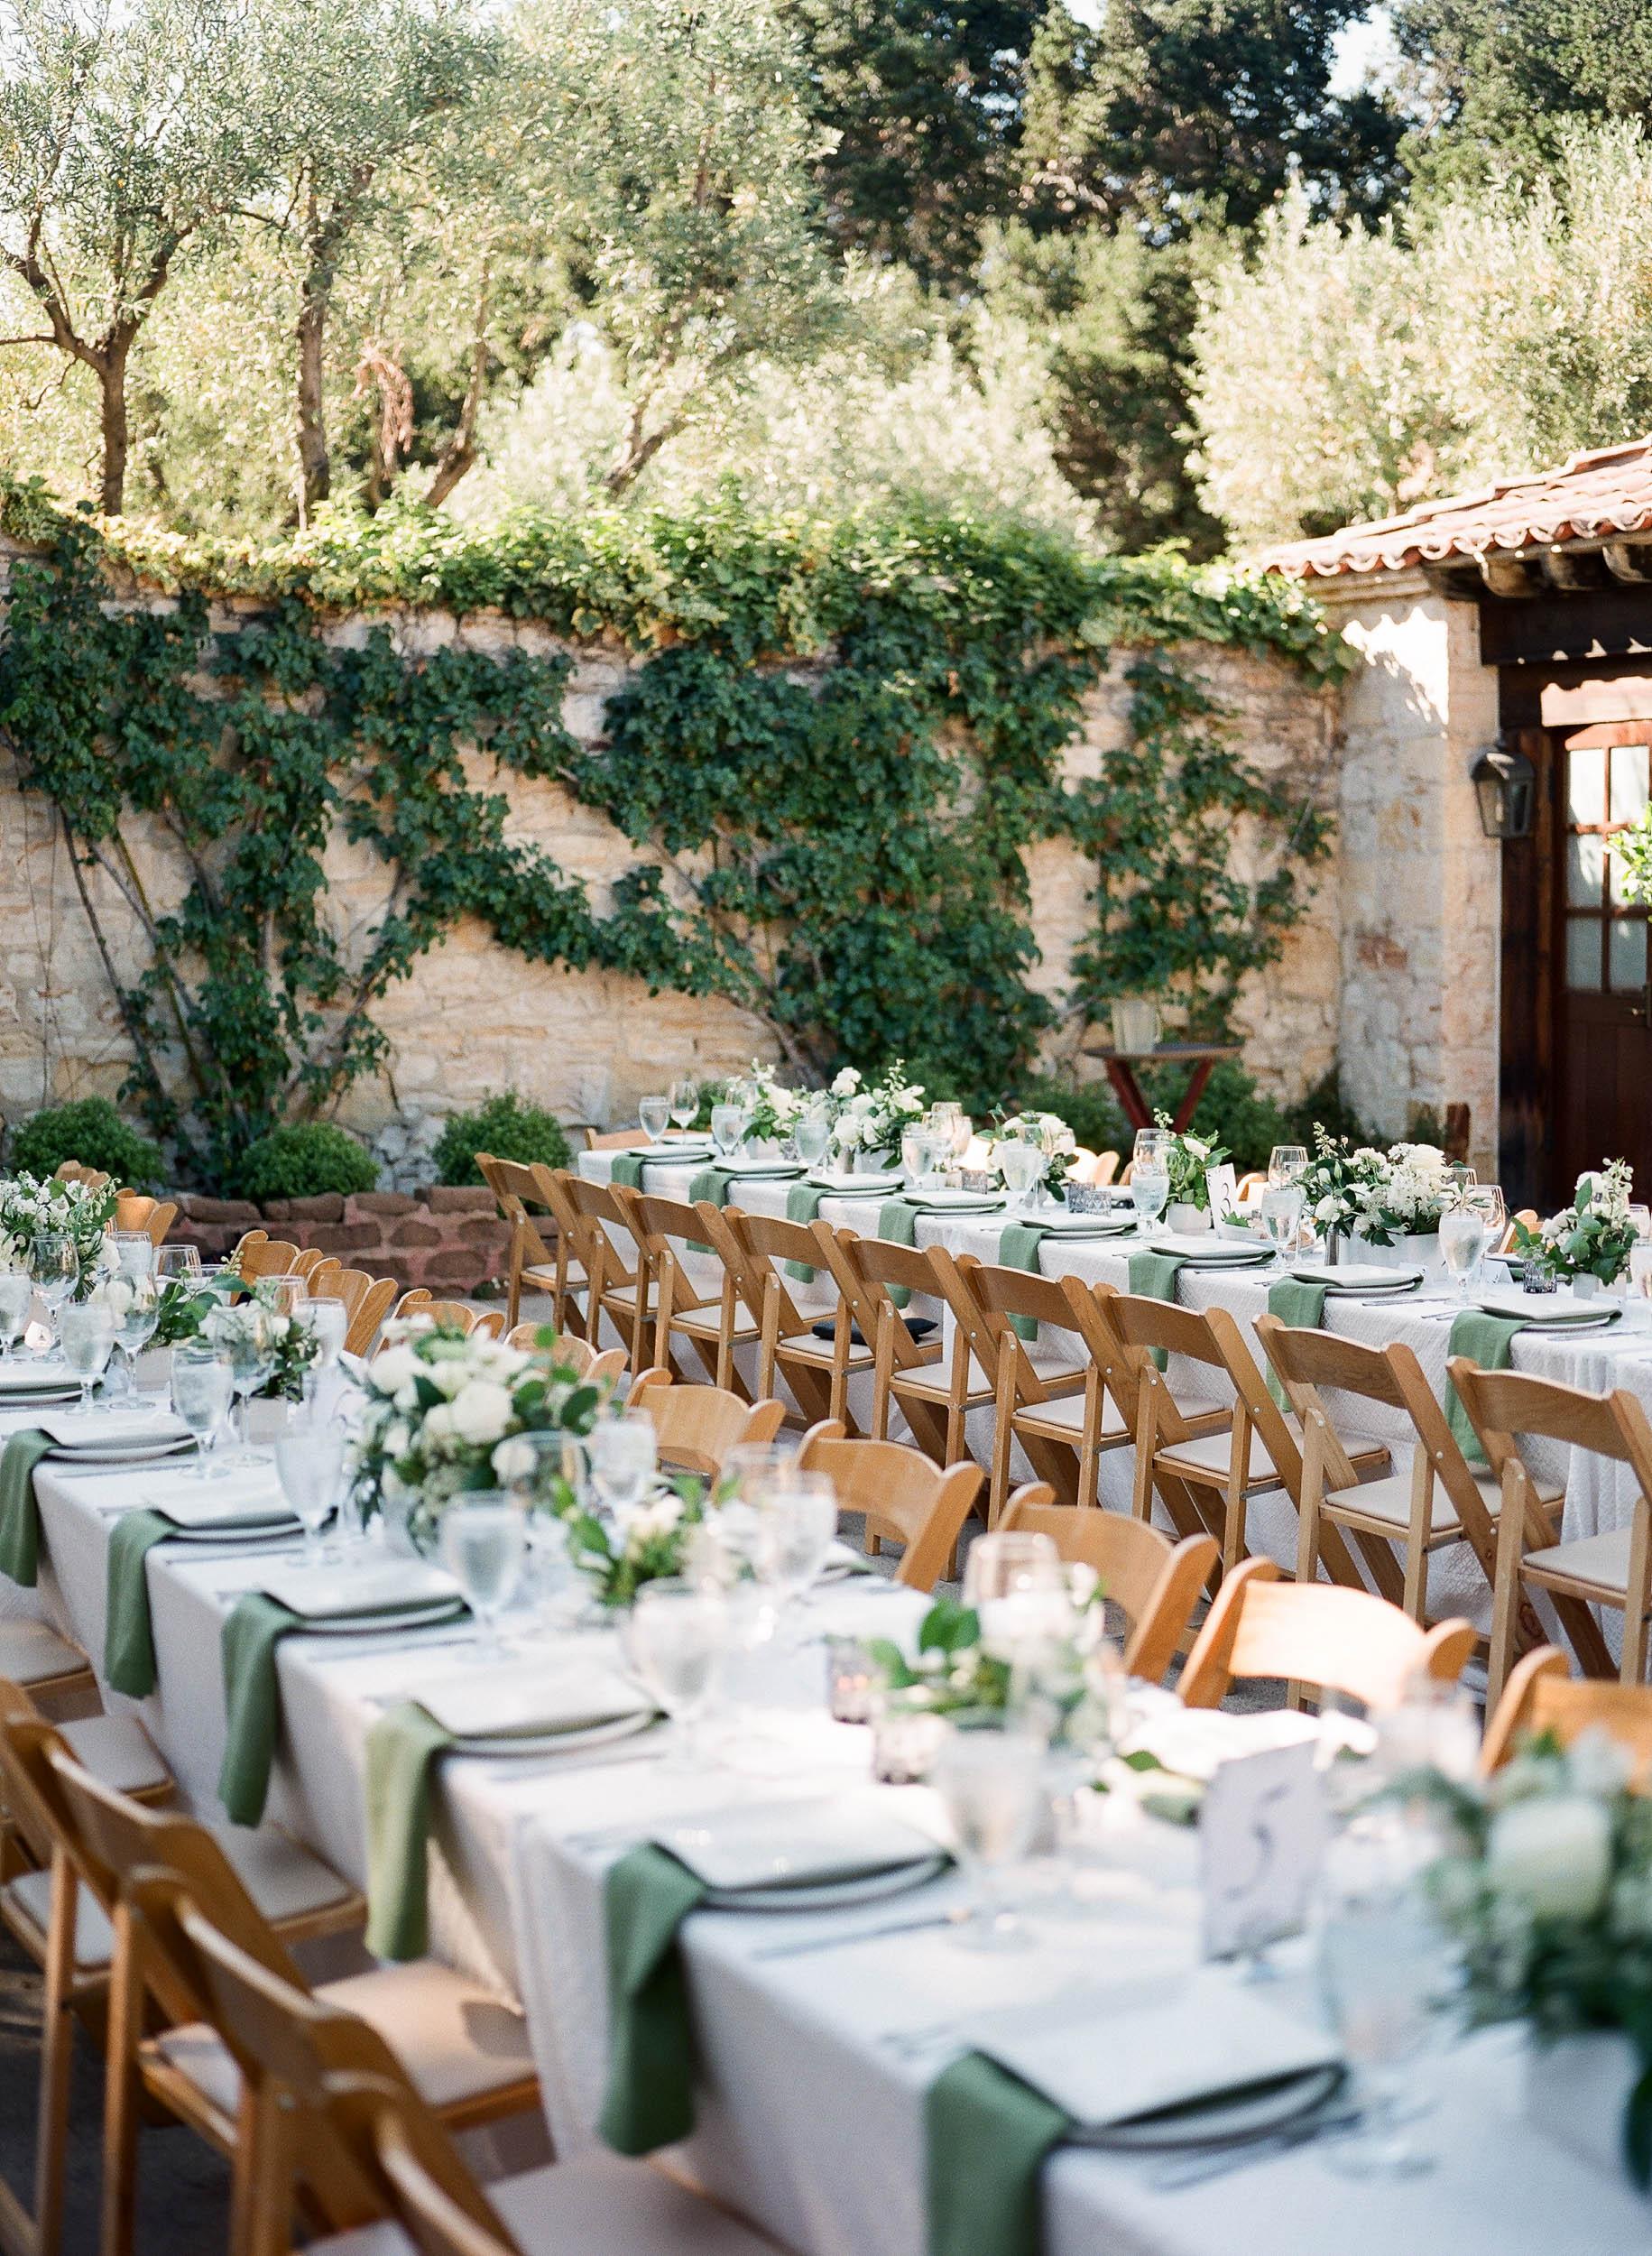 076_072118_D+K_Holman Ranch Wedding_Buena Lane Photography_00005424_174.jpg